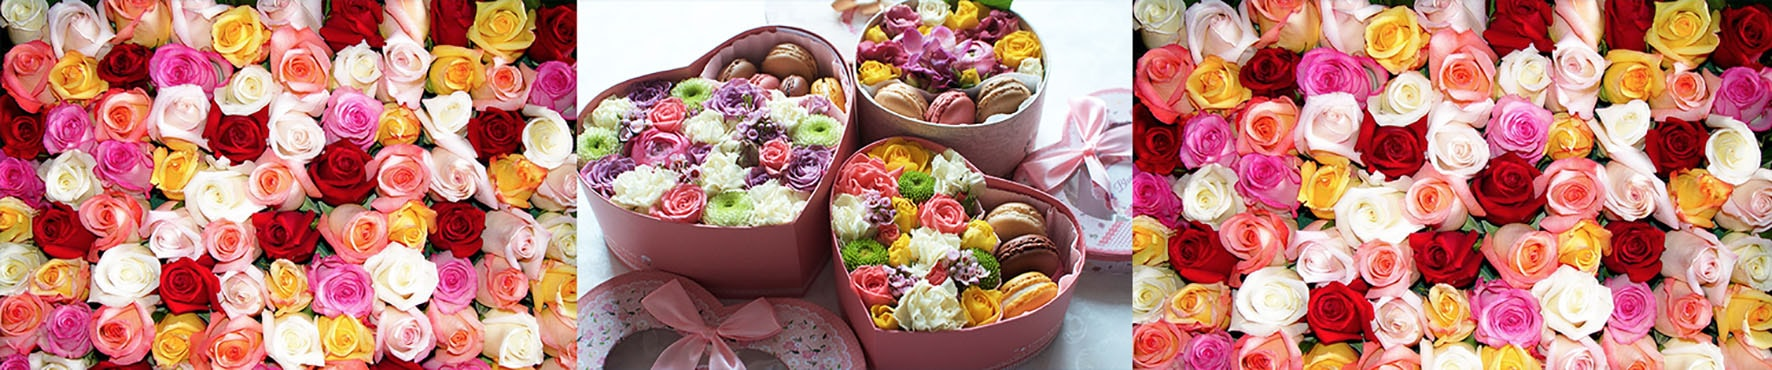 салон цветов Florange сайт